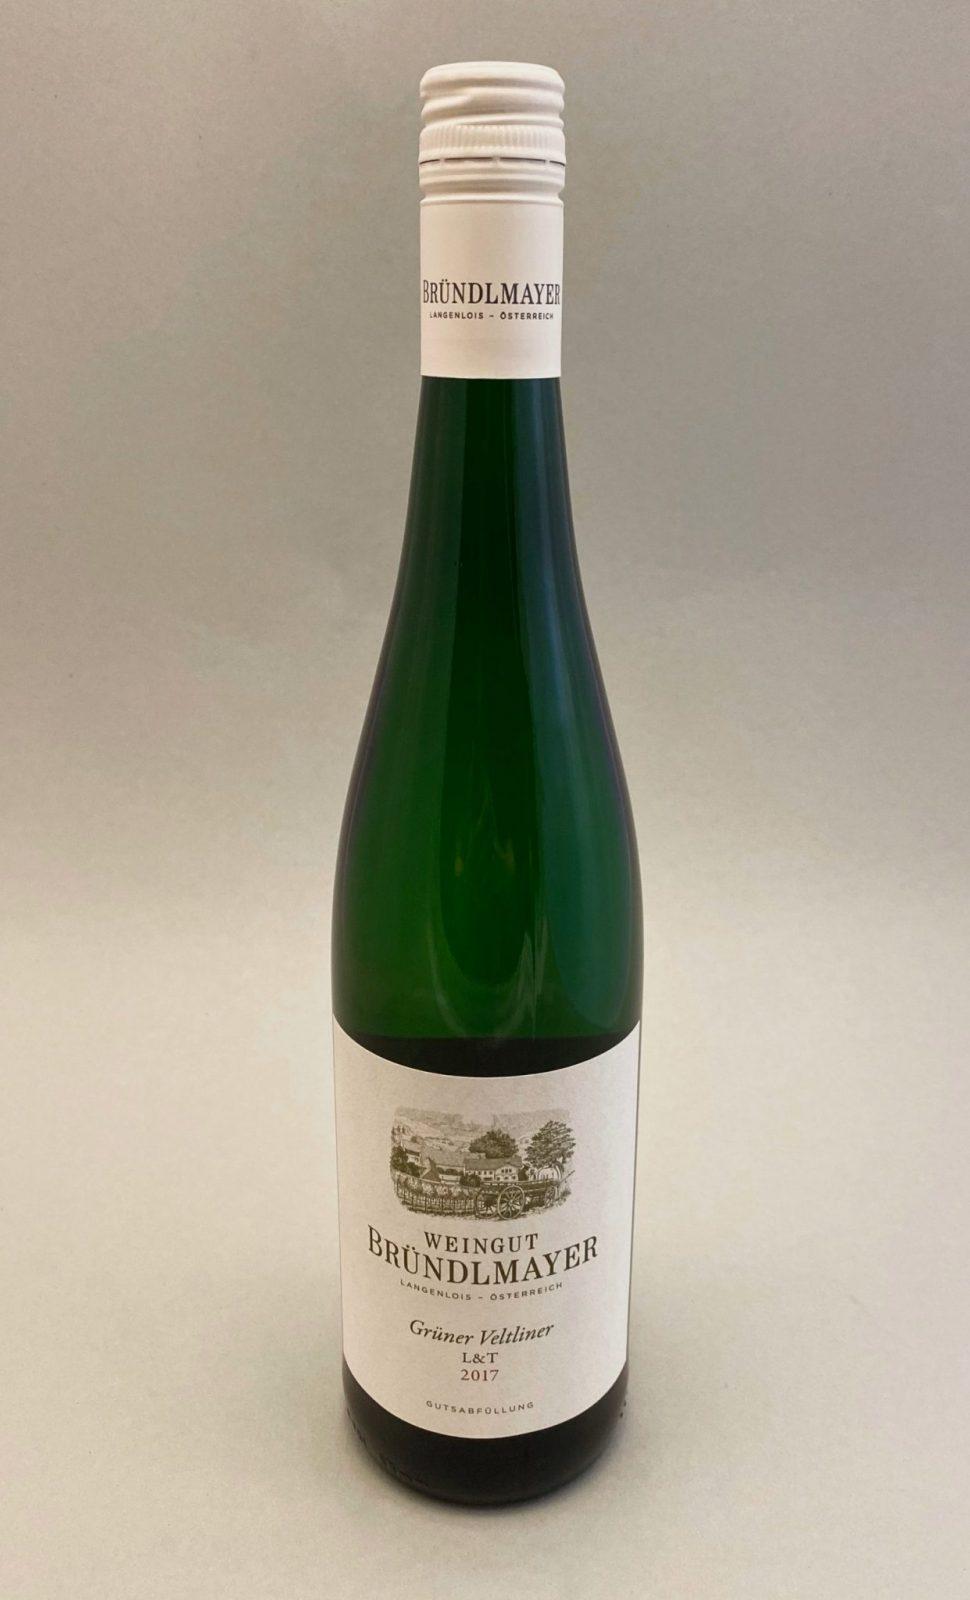 WEINGUT - Bründlmayer Grüner Veltliner, 0,75, vinoteka, Slnečnice viladomy Bratislaval